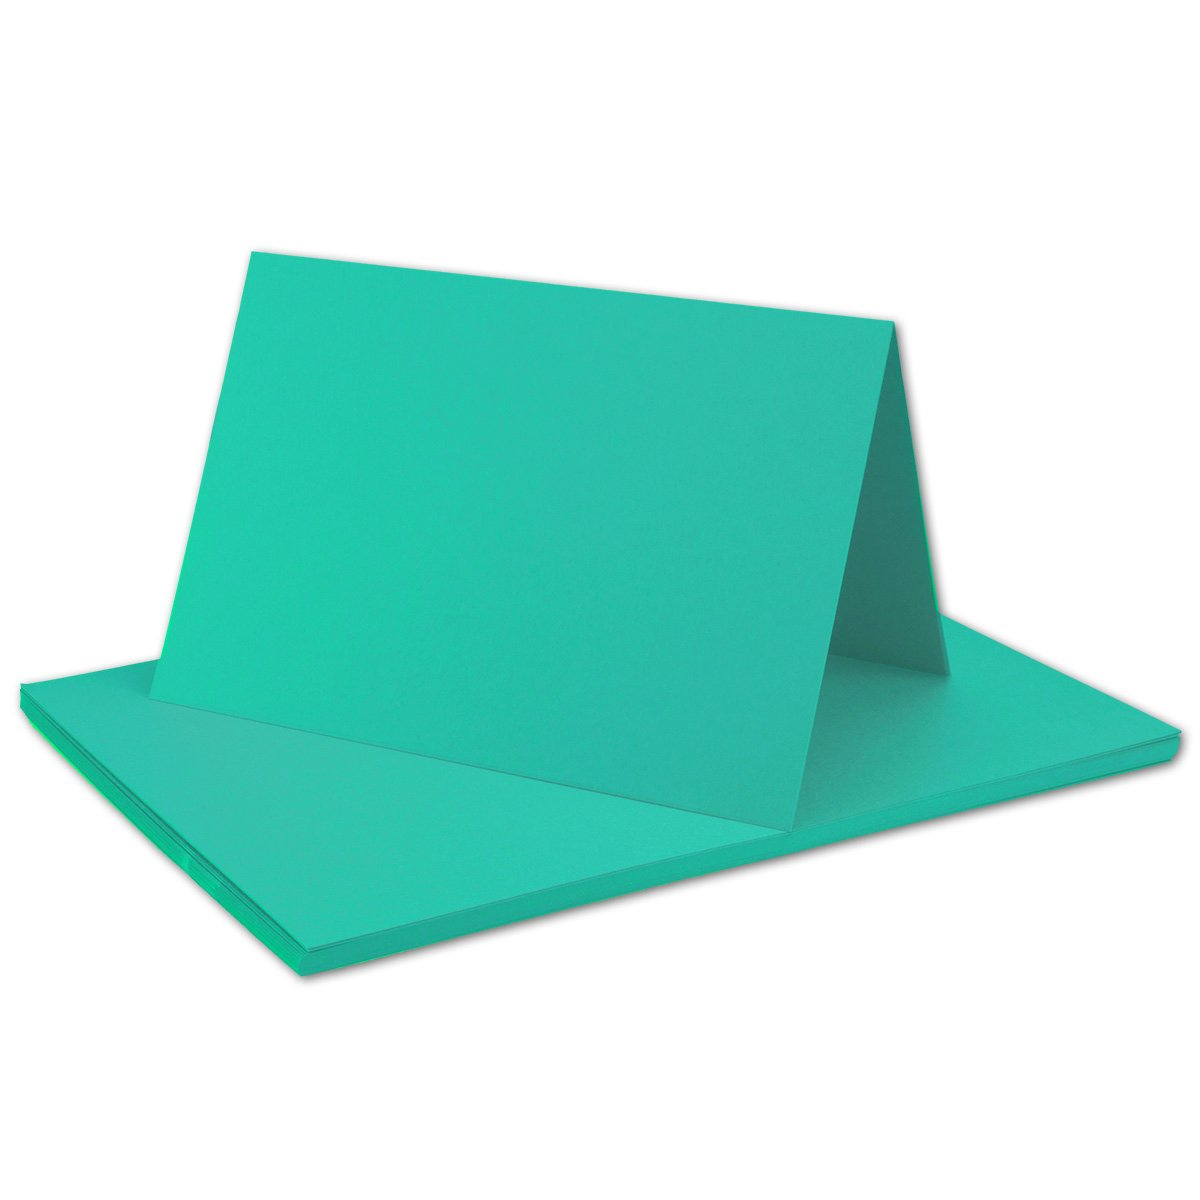 Premium Qualit/ät FarbenFroh/® 50x Falt-Karten DIN A6 Blanko Doppel-Karten in Pazifikblau 10,5 x 14,8 cm